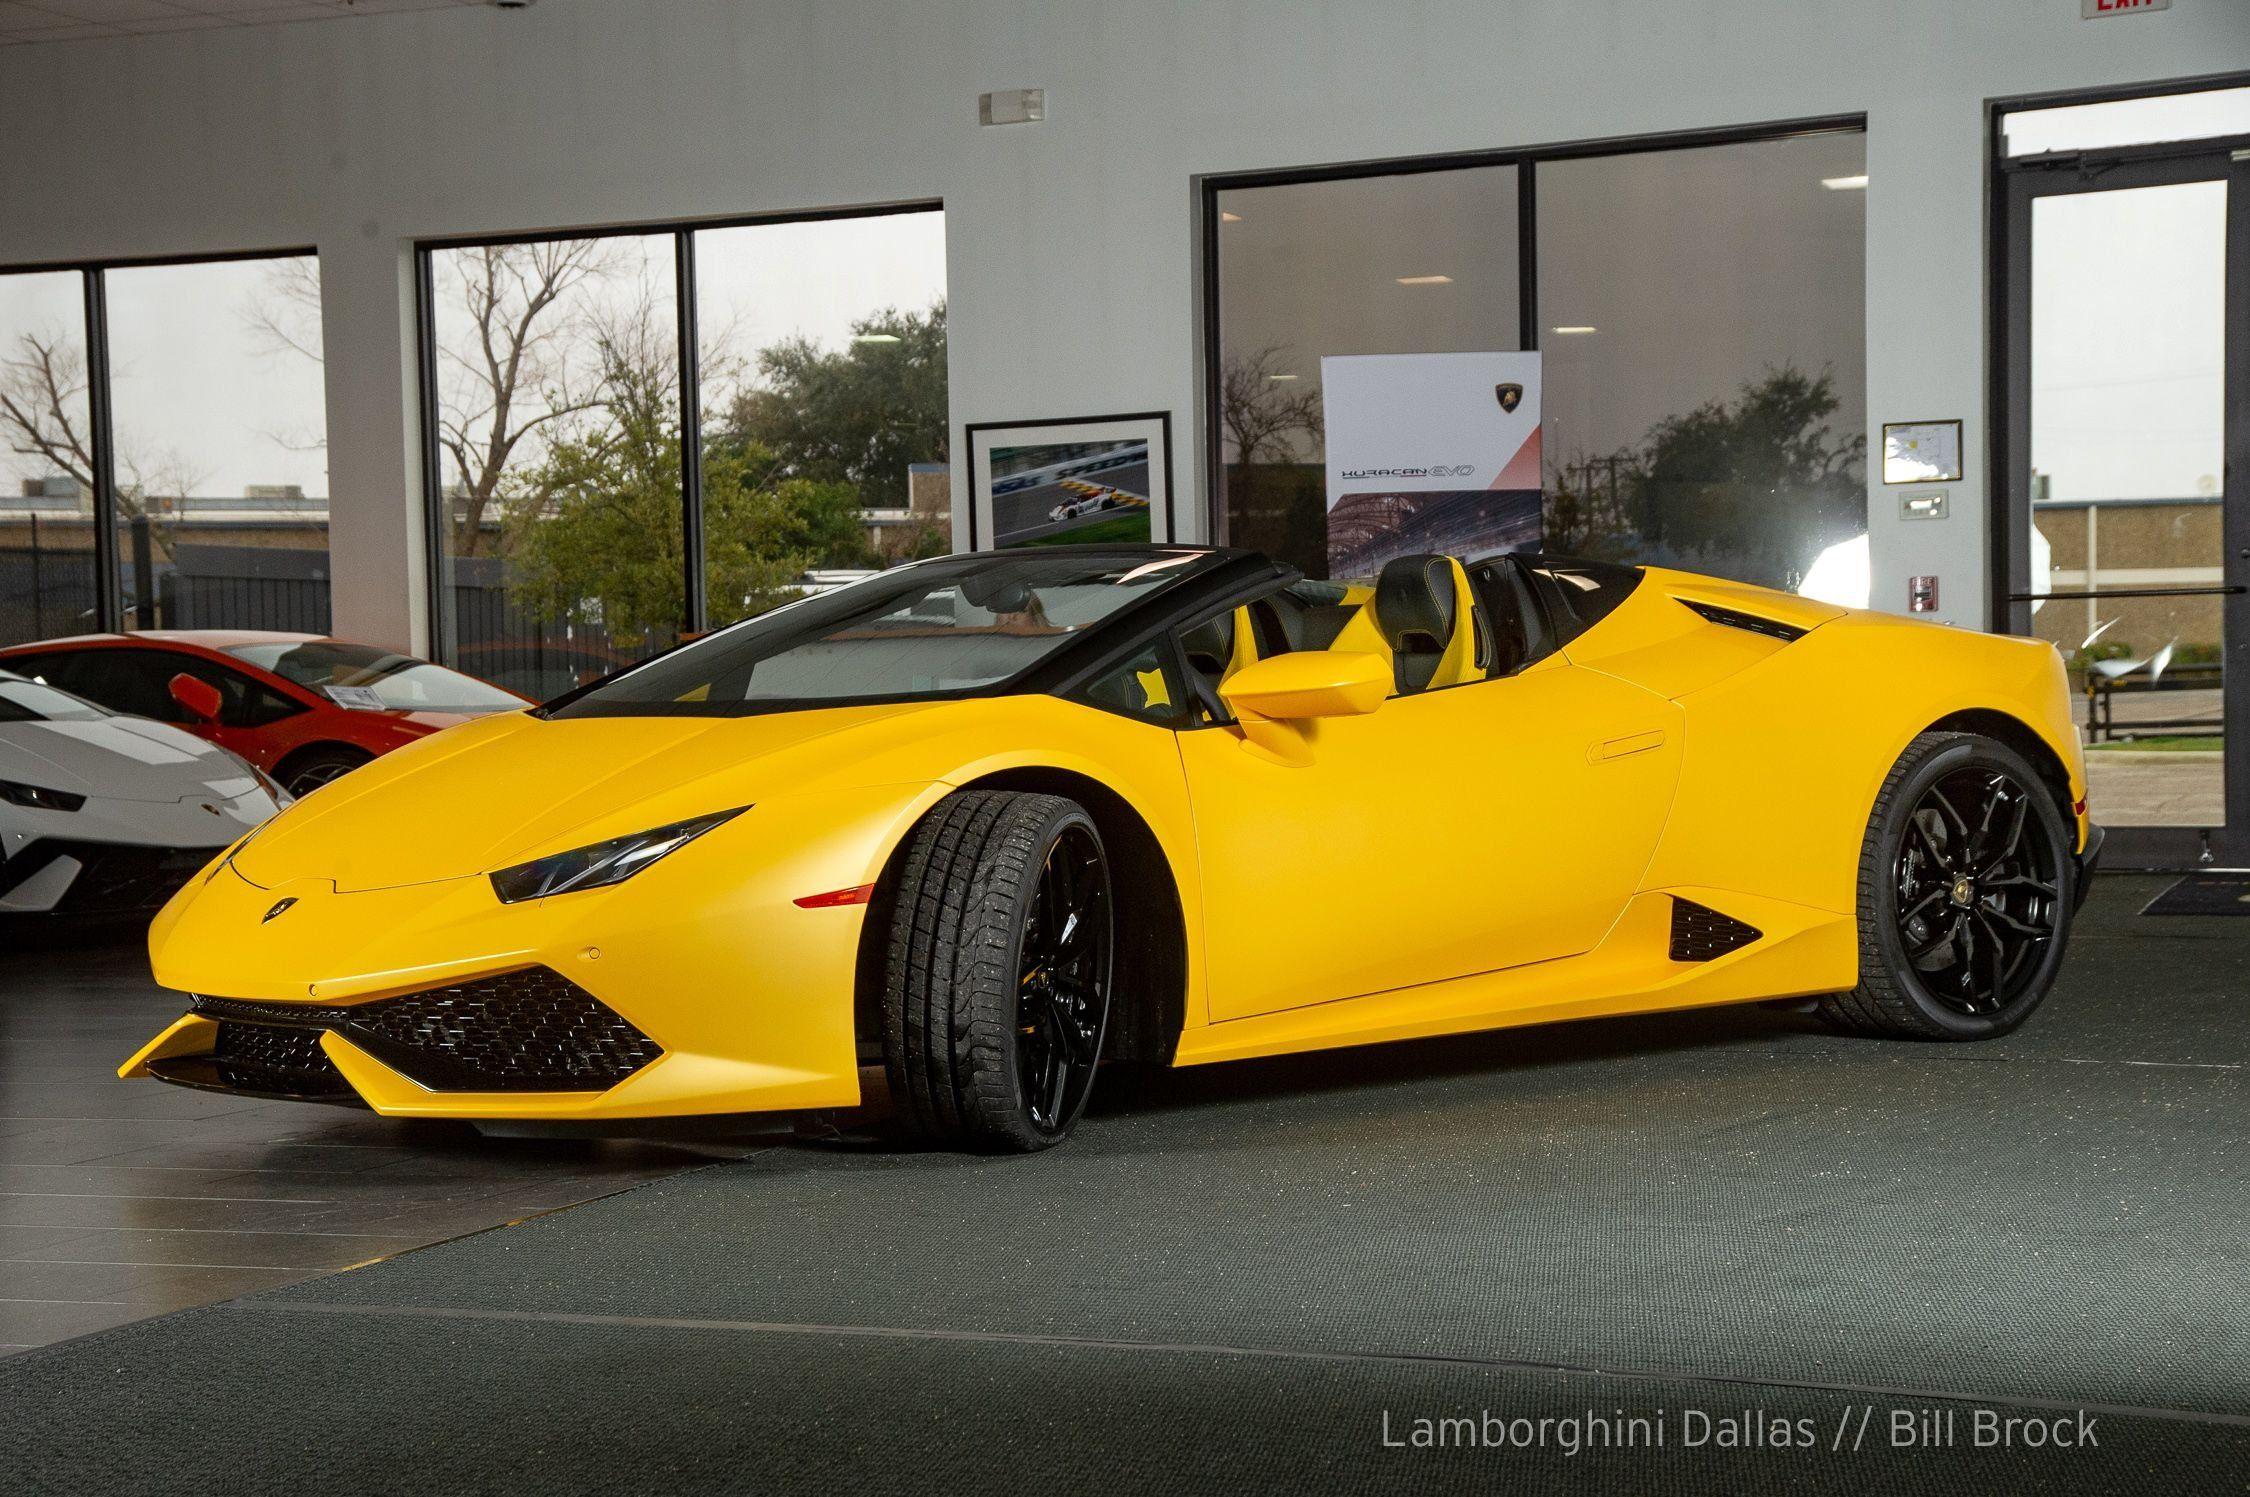 2016 Lamborghini Huracan Lp610 4 Spyder Lamborghini Dallas United States For Sale On Luxurypulse Lamborghini Huracan Lamborghini Lamborghini Dallas